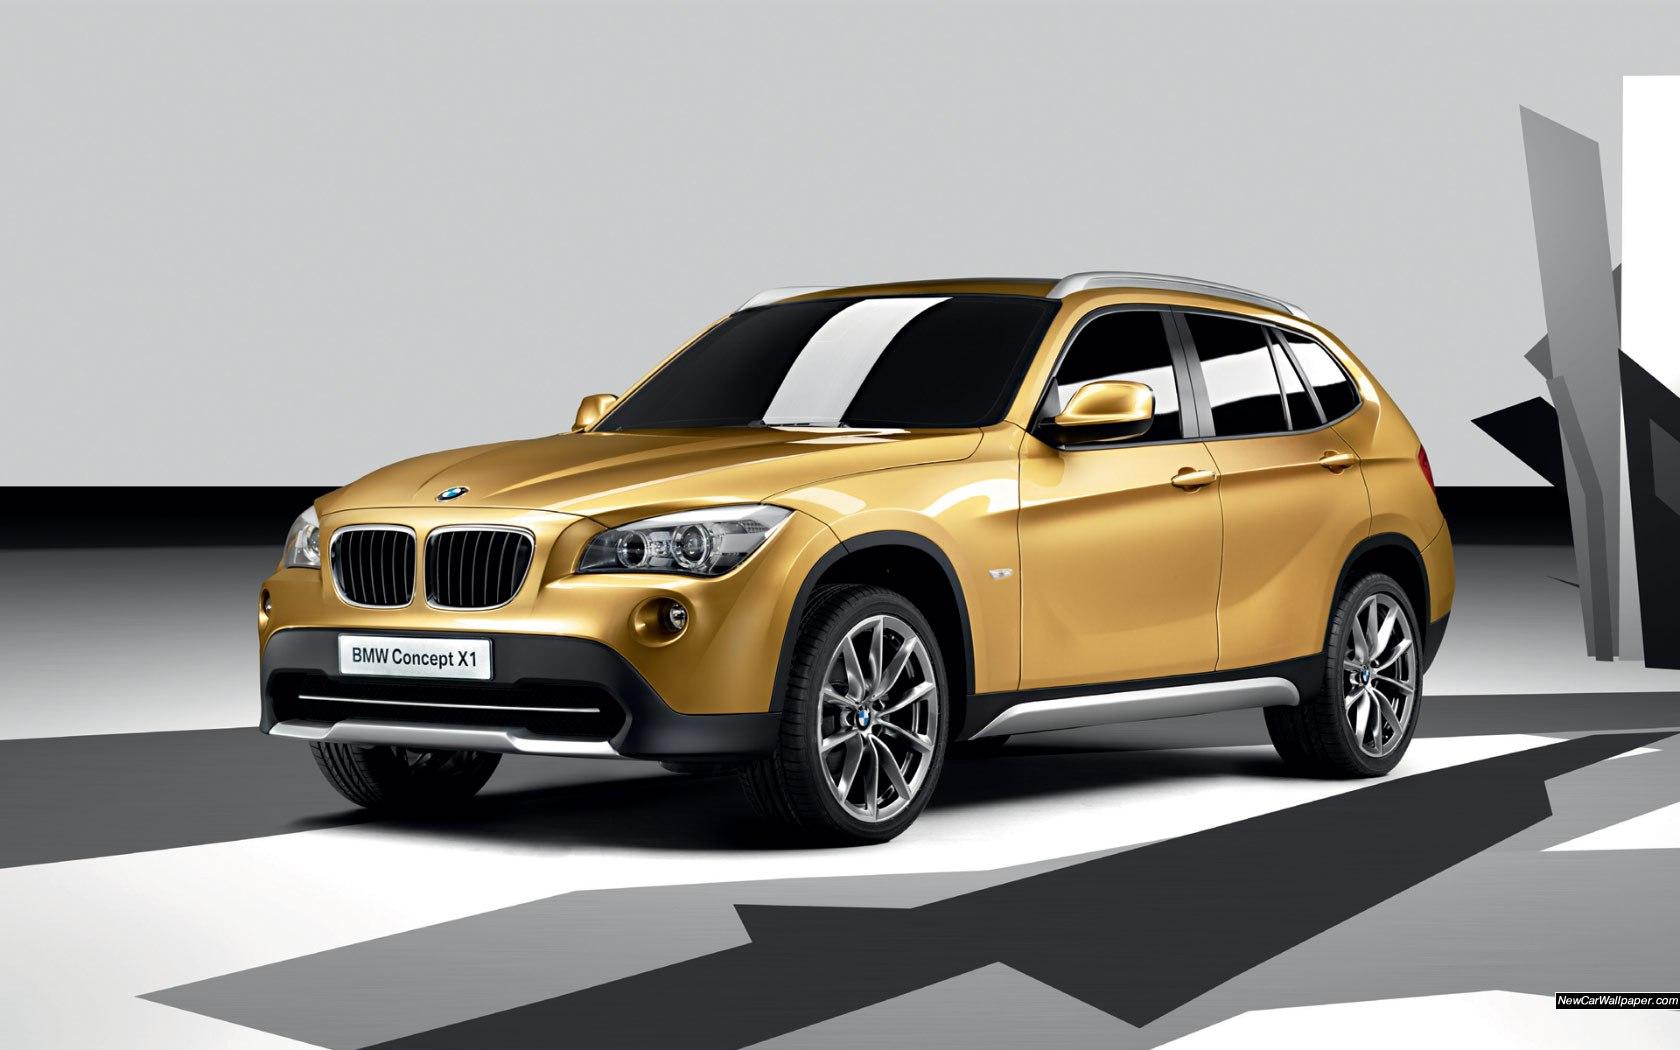 BMW_X1_Concept_8735_1680x1050